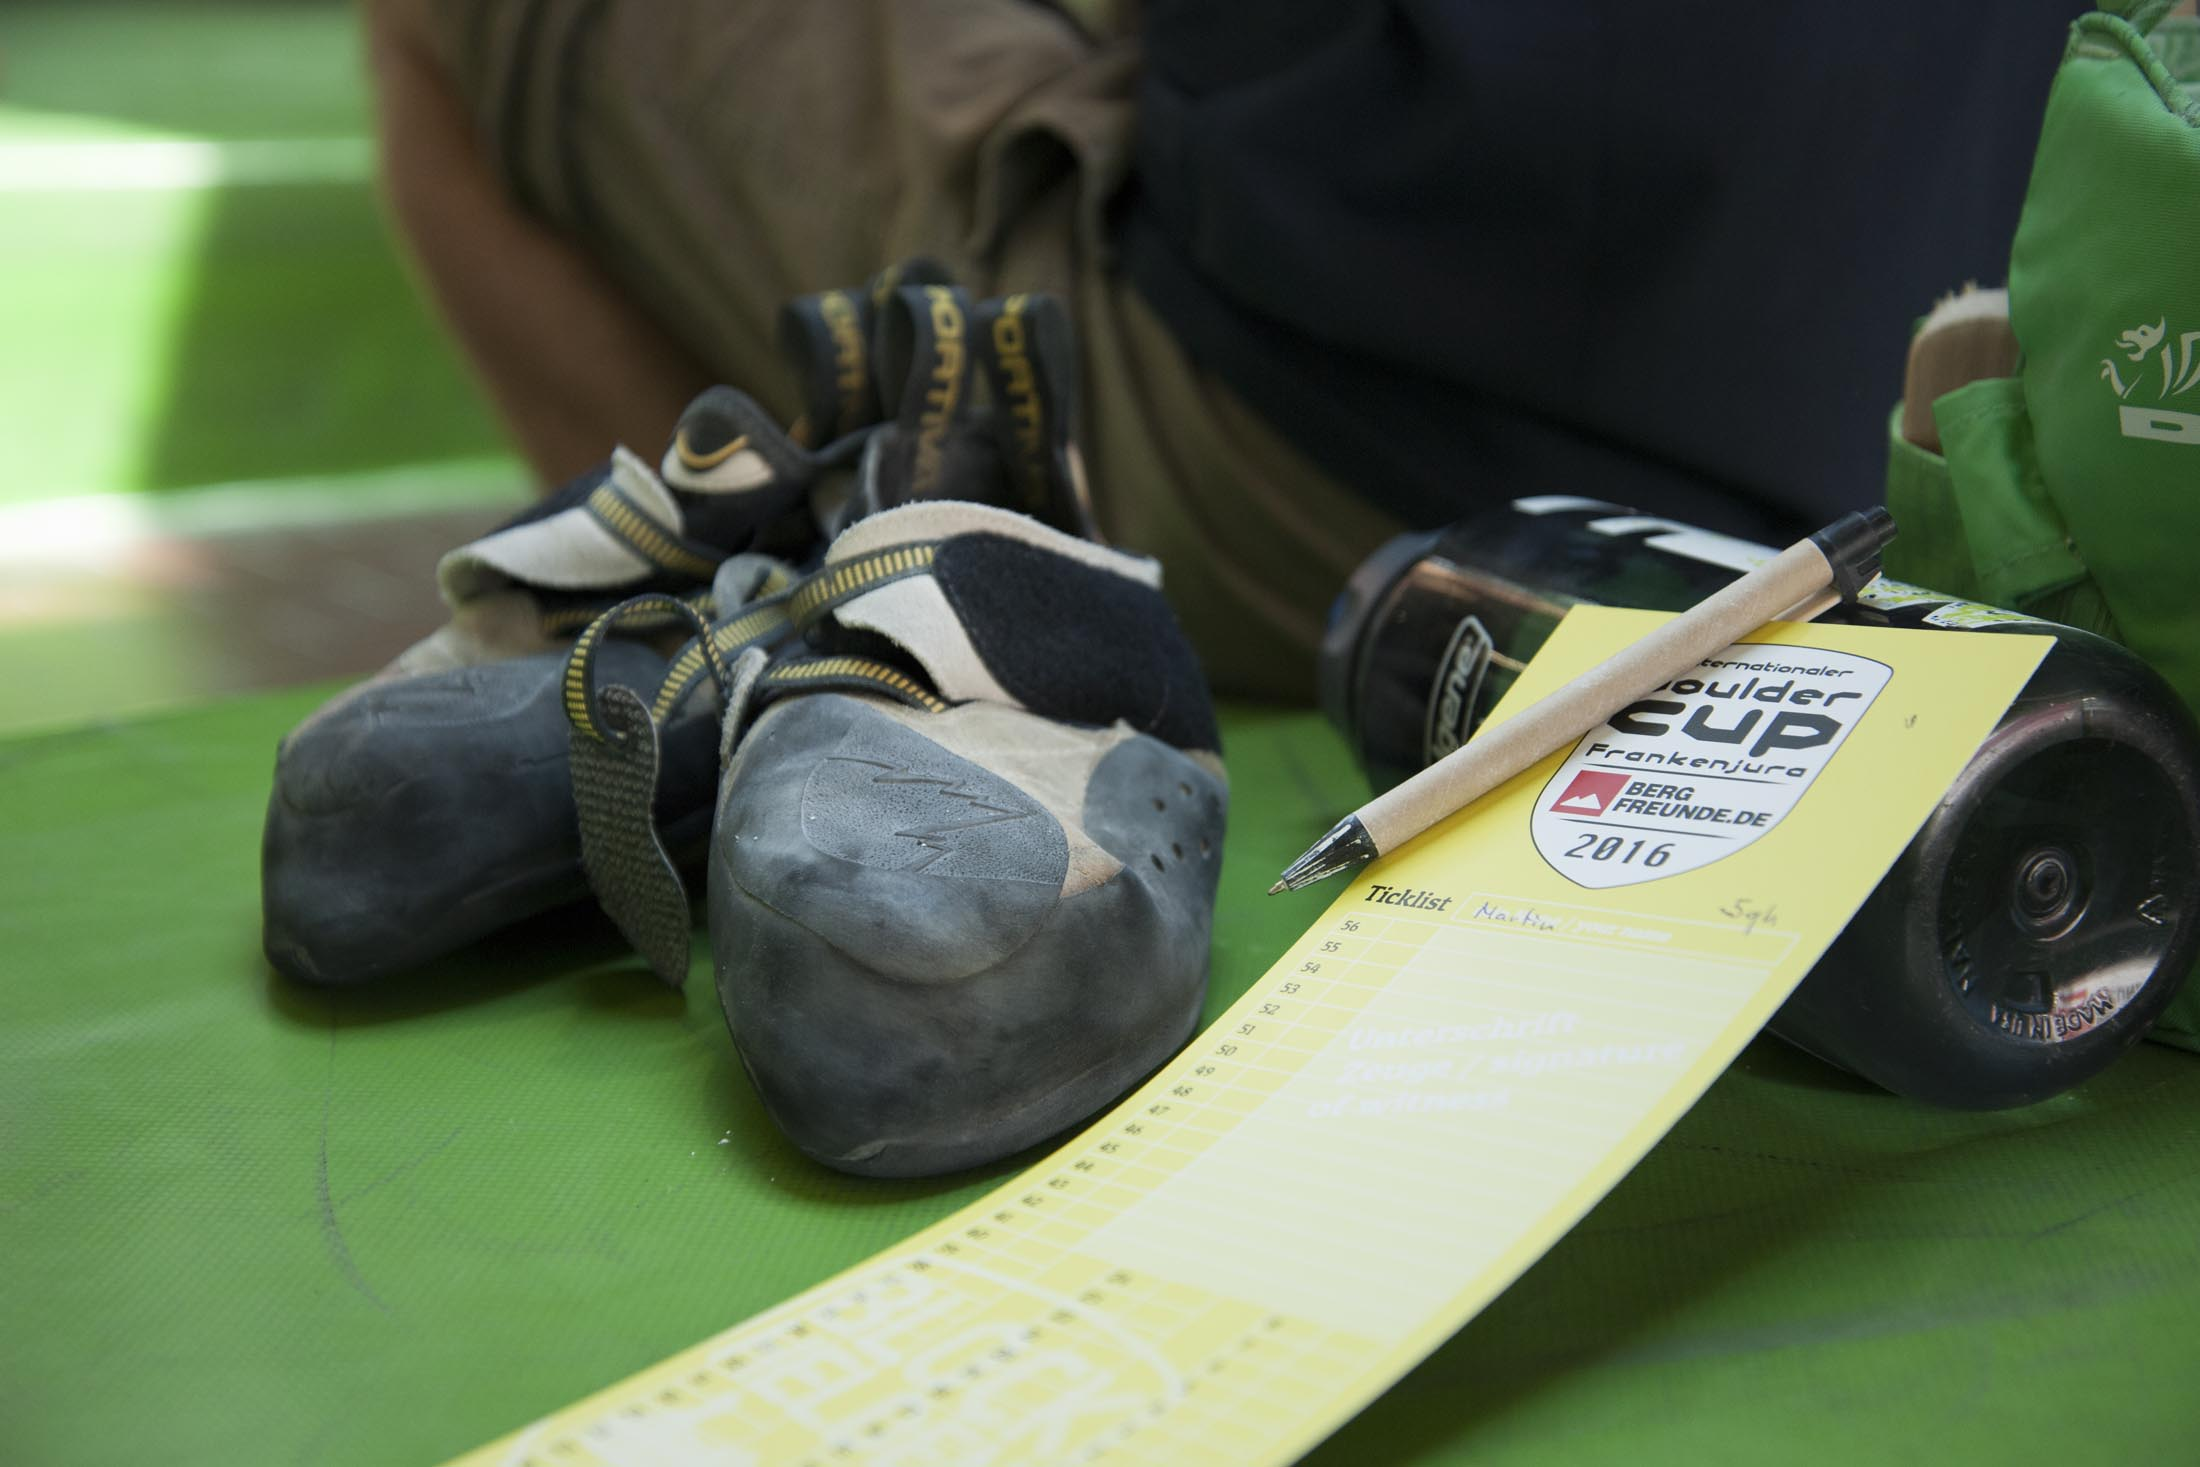 Registration internationaler bouldercup Frankenjura 2016, BLOCKHELDEN Erlangen, Mammut, Bergfreunde.de, Boulderwettkampf07092016082